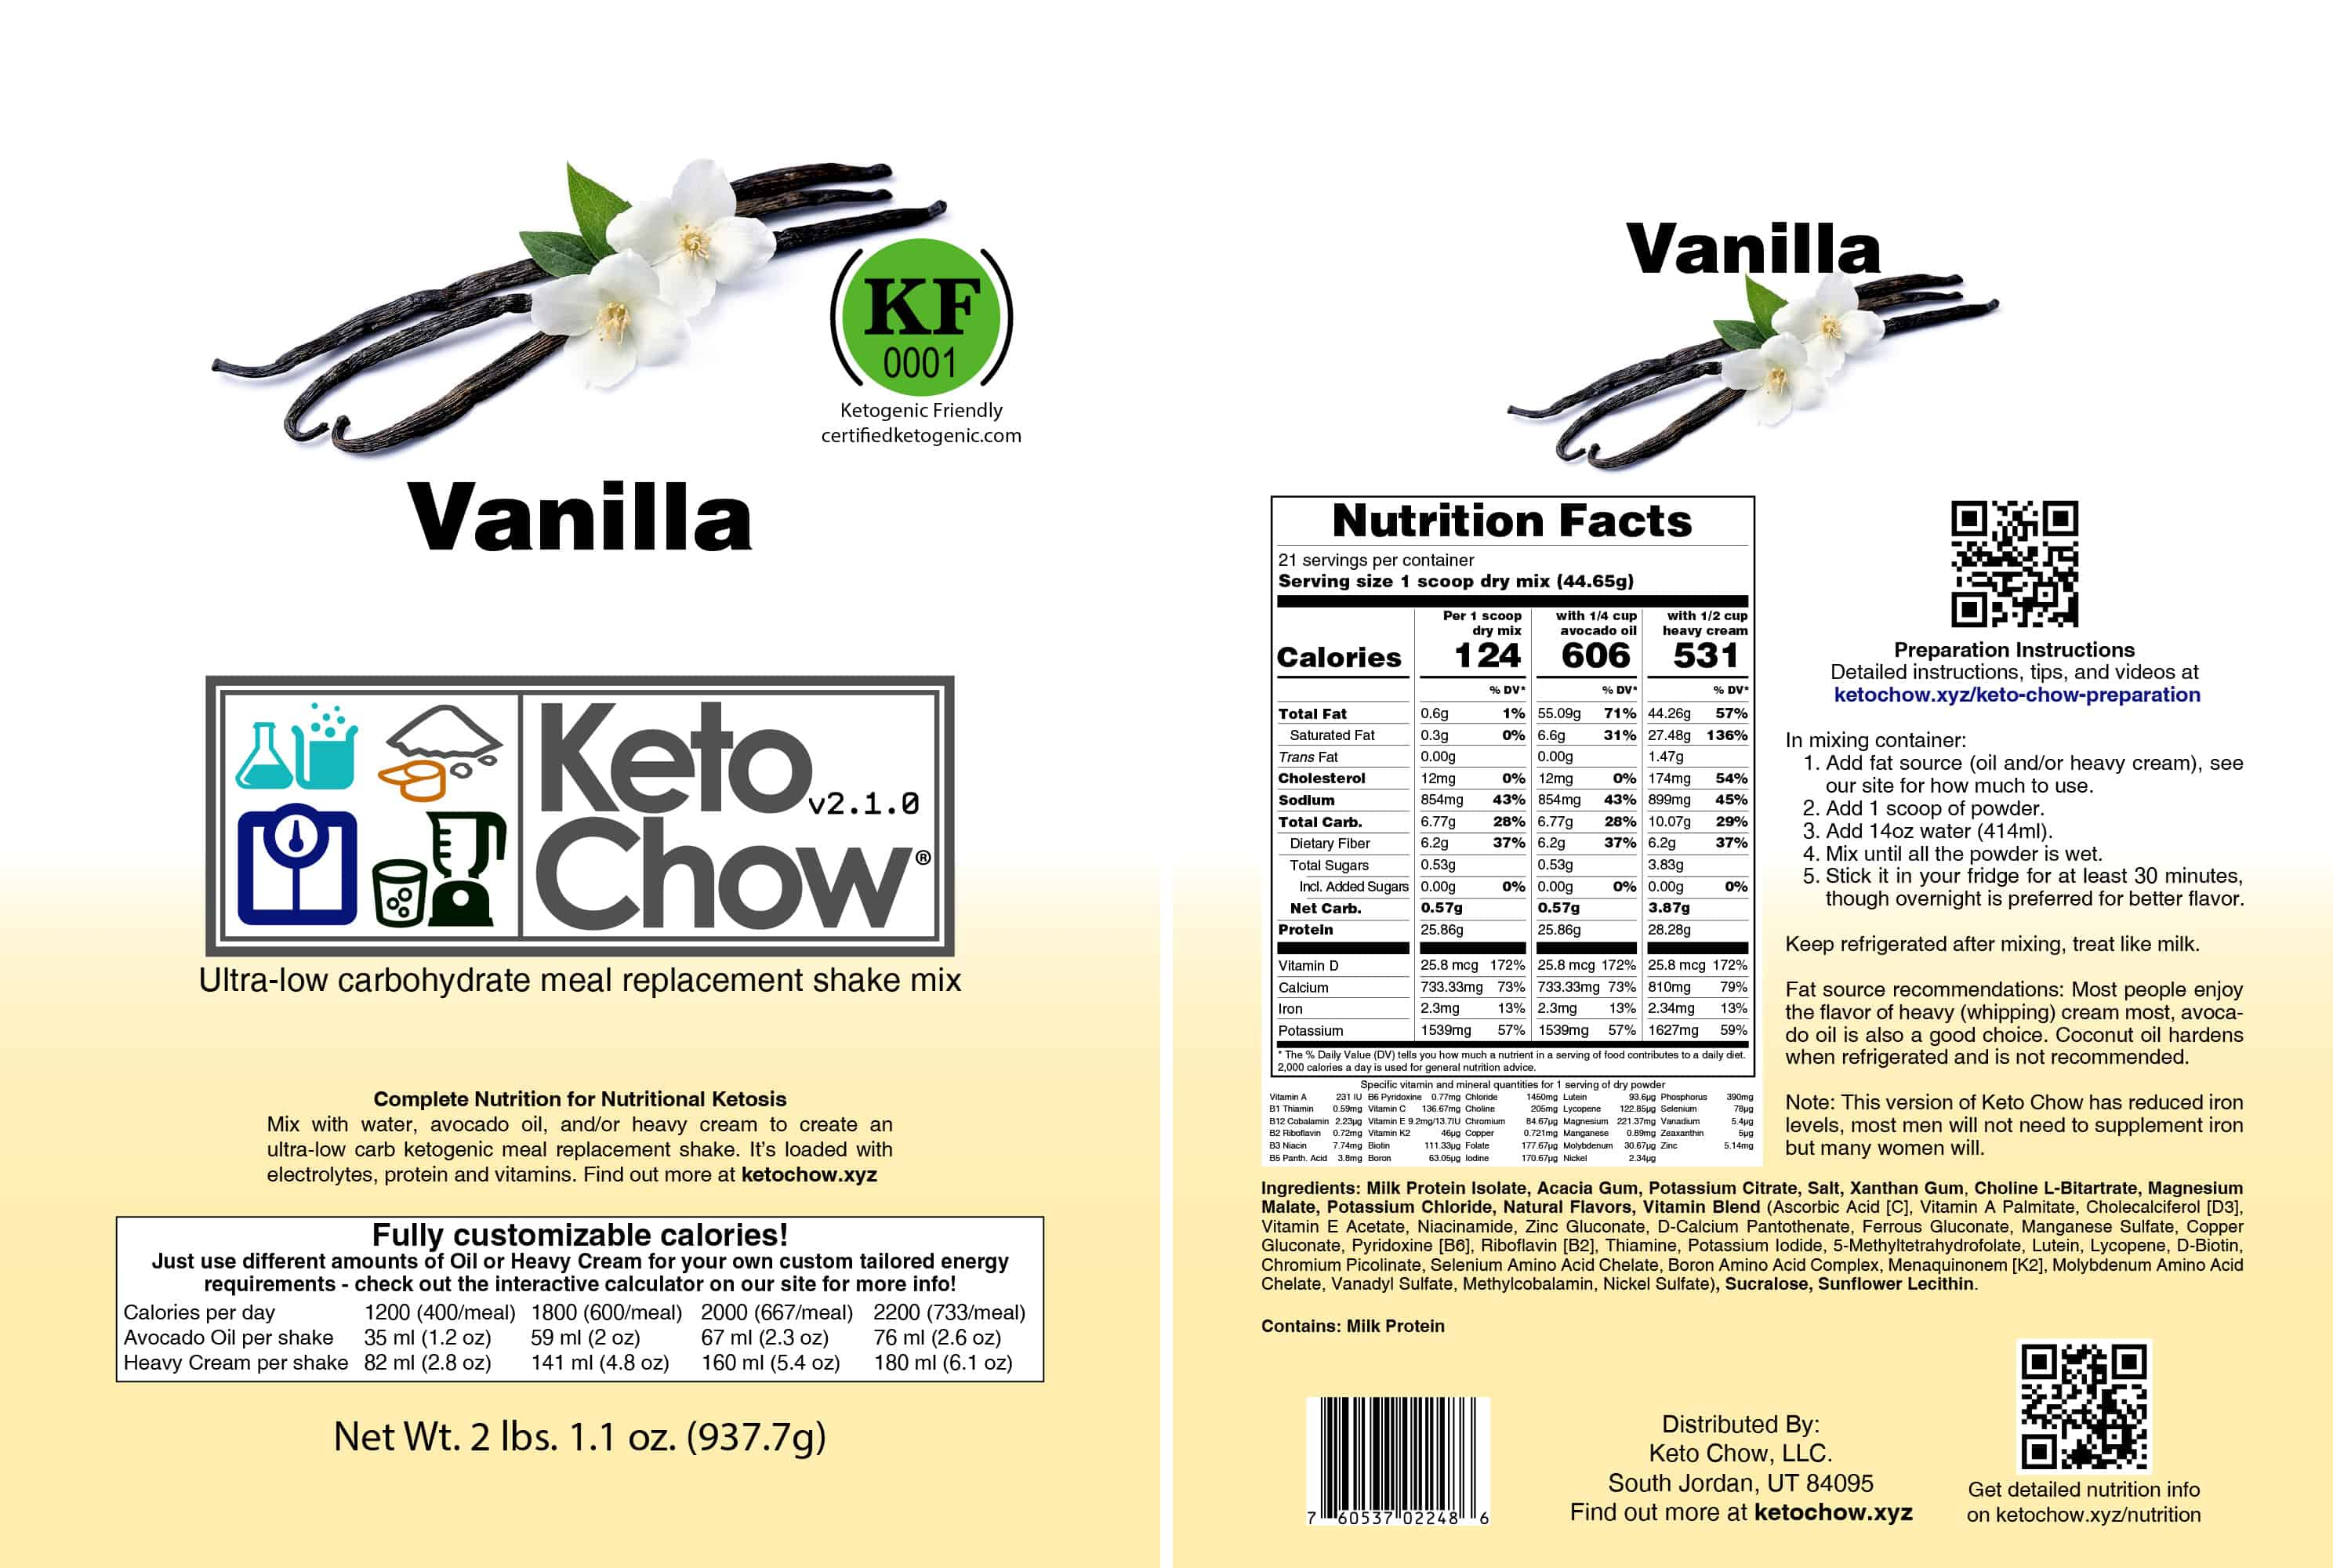 keto-chow-nutrition-info